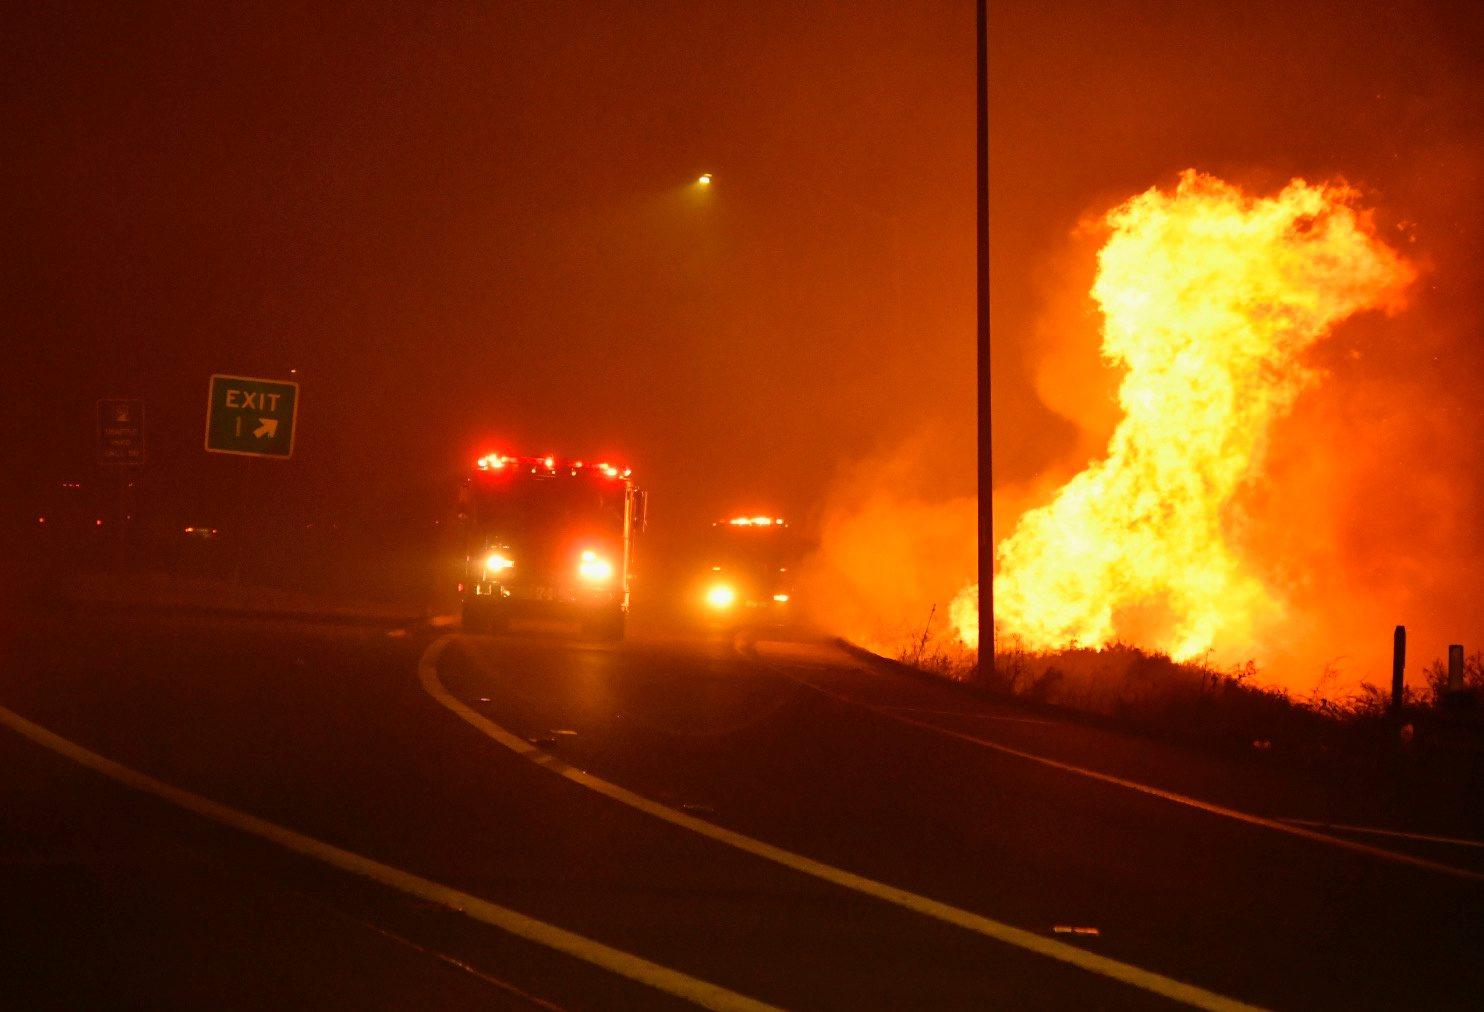 2019-10-11T064219Z_1833275886_RC131D7B30B0_RTRMADP_3_CALIFORNIA-FIRES